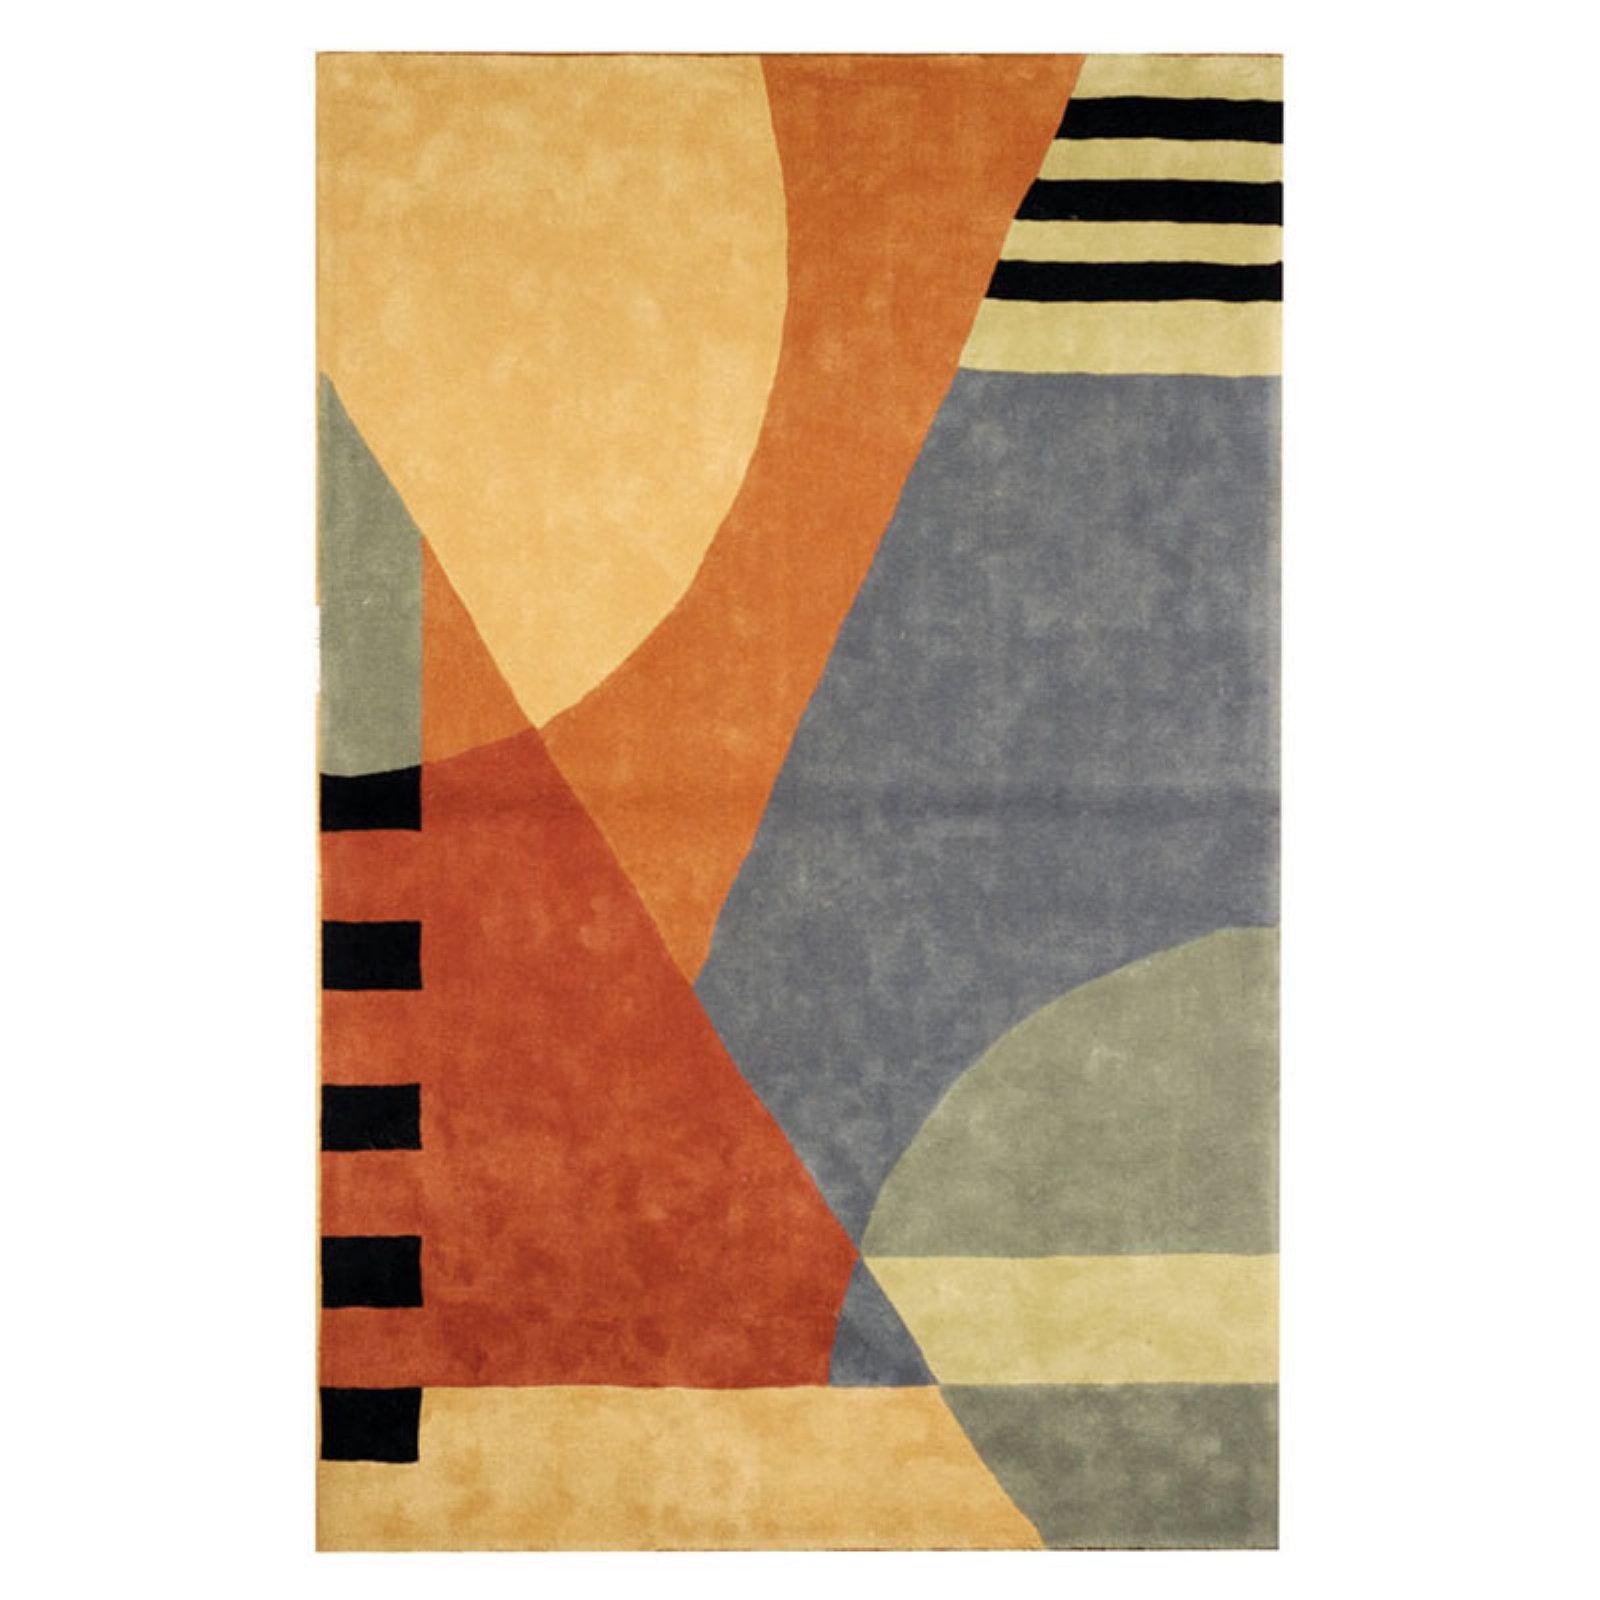 Safavieh Rodeo Drive Marsan Hand Tufted Wool Area Rug, Gold